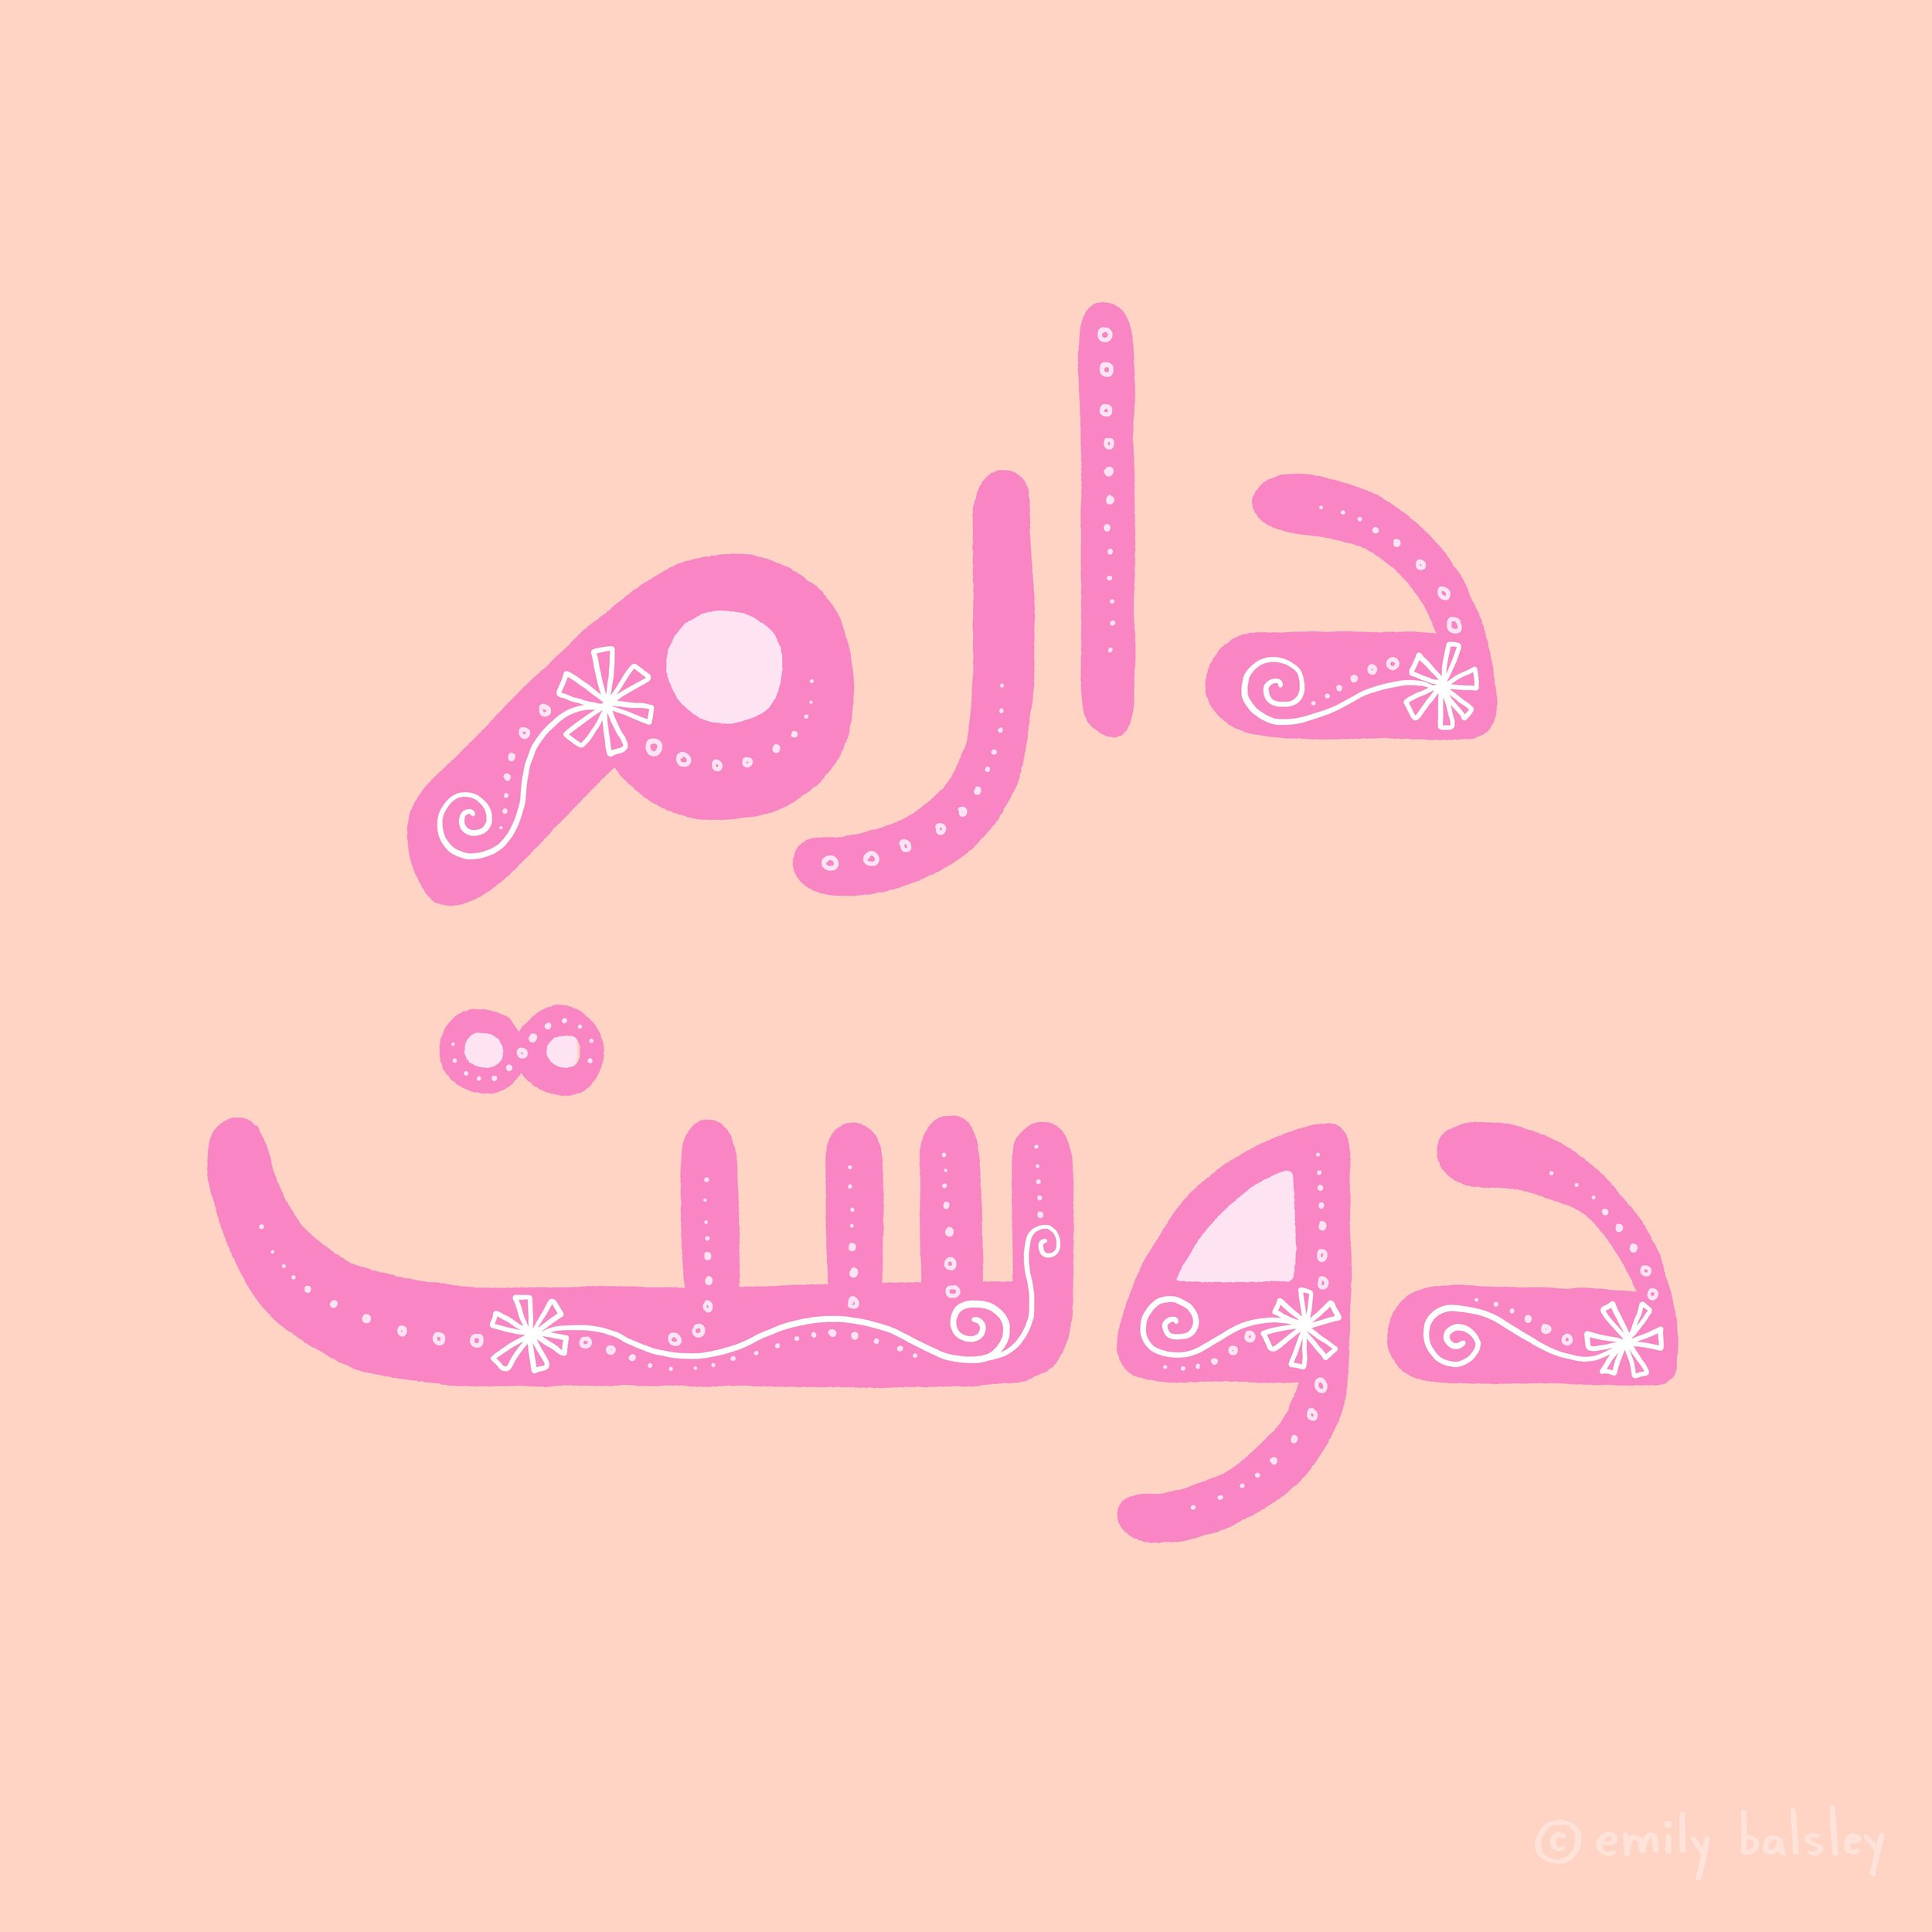 100days_-_Day18_-_Farsi.jpg